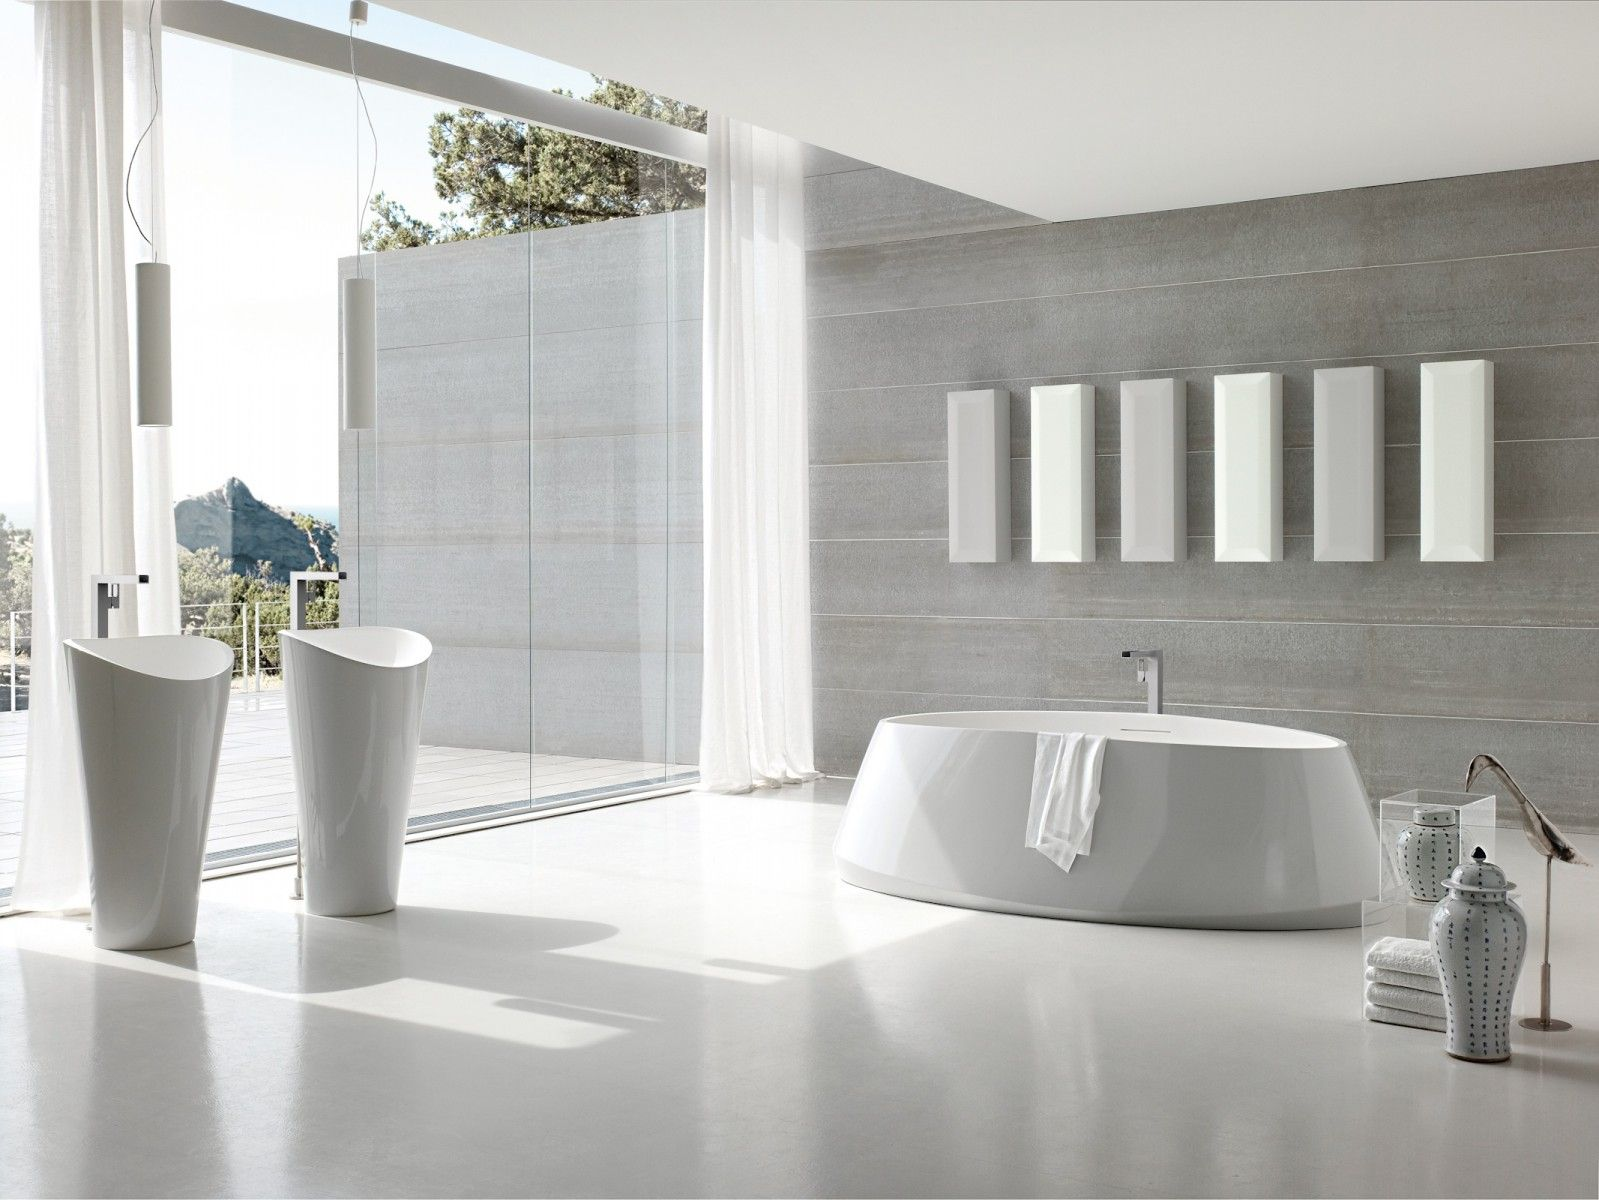 High End Modern Bathroom Vanity inspiration to decor modern bathroom design ideas bring a beauty